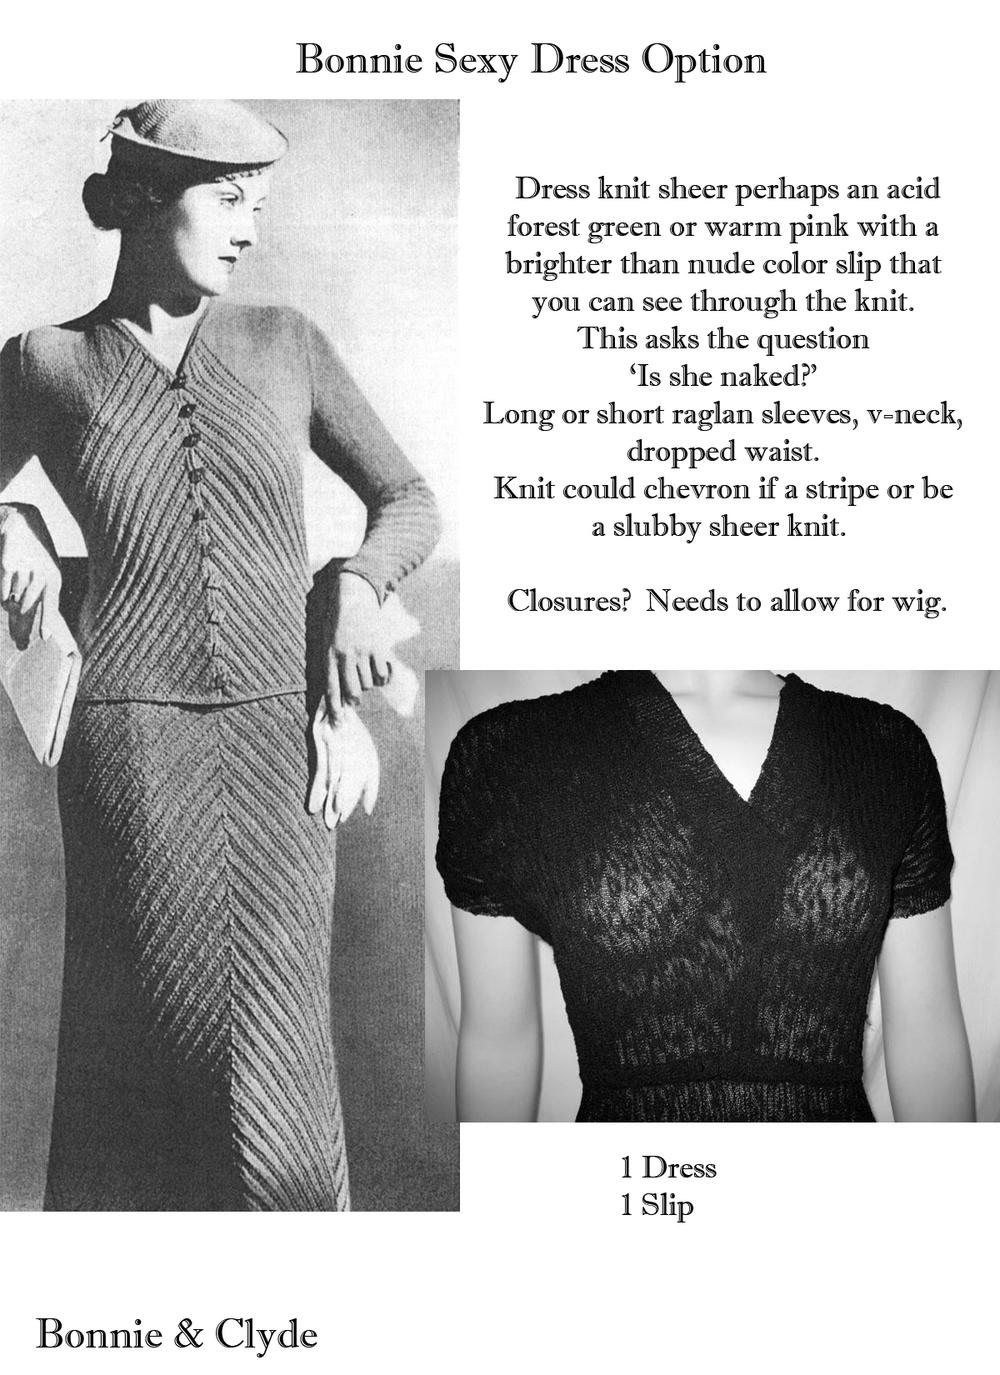 Bonnie Sexy dress option.jpg